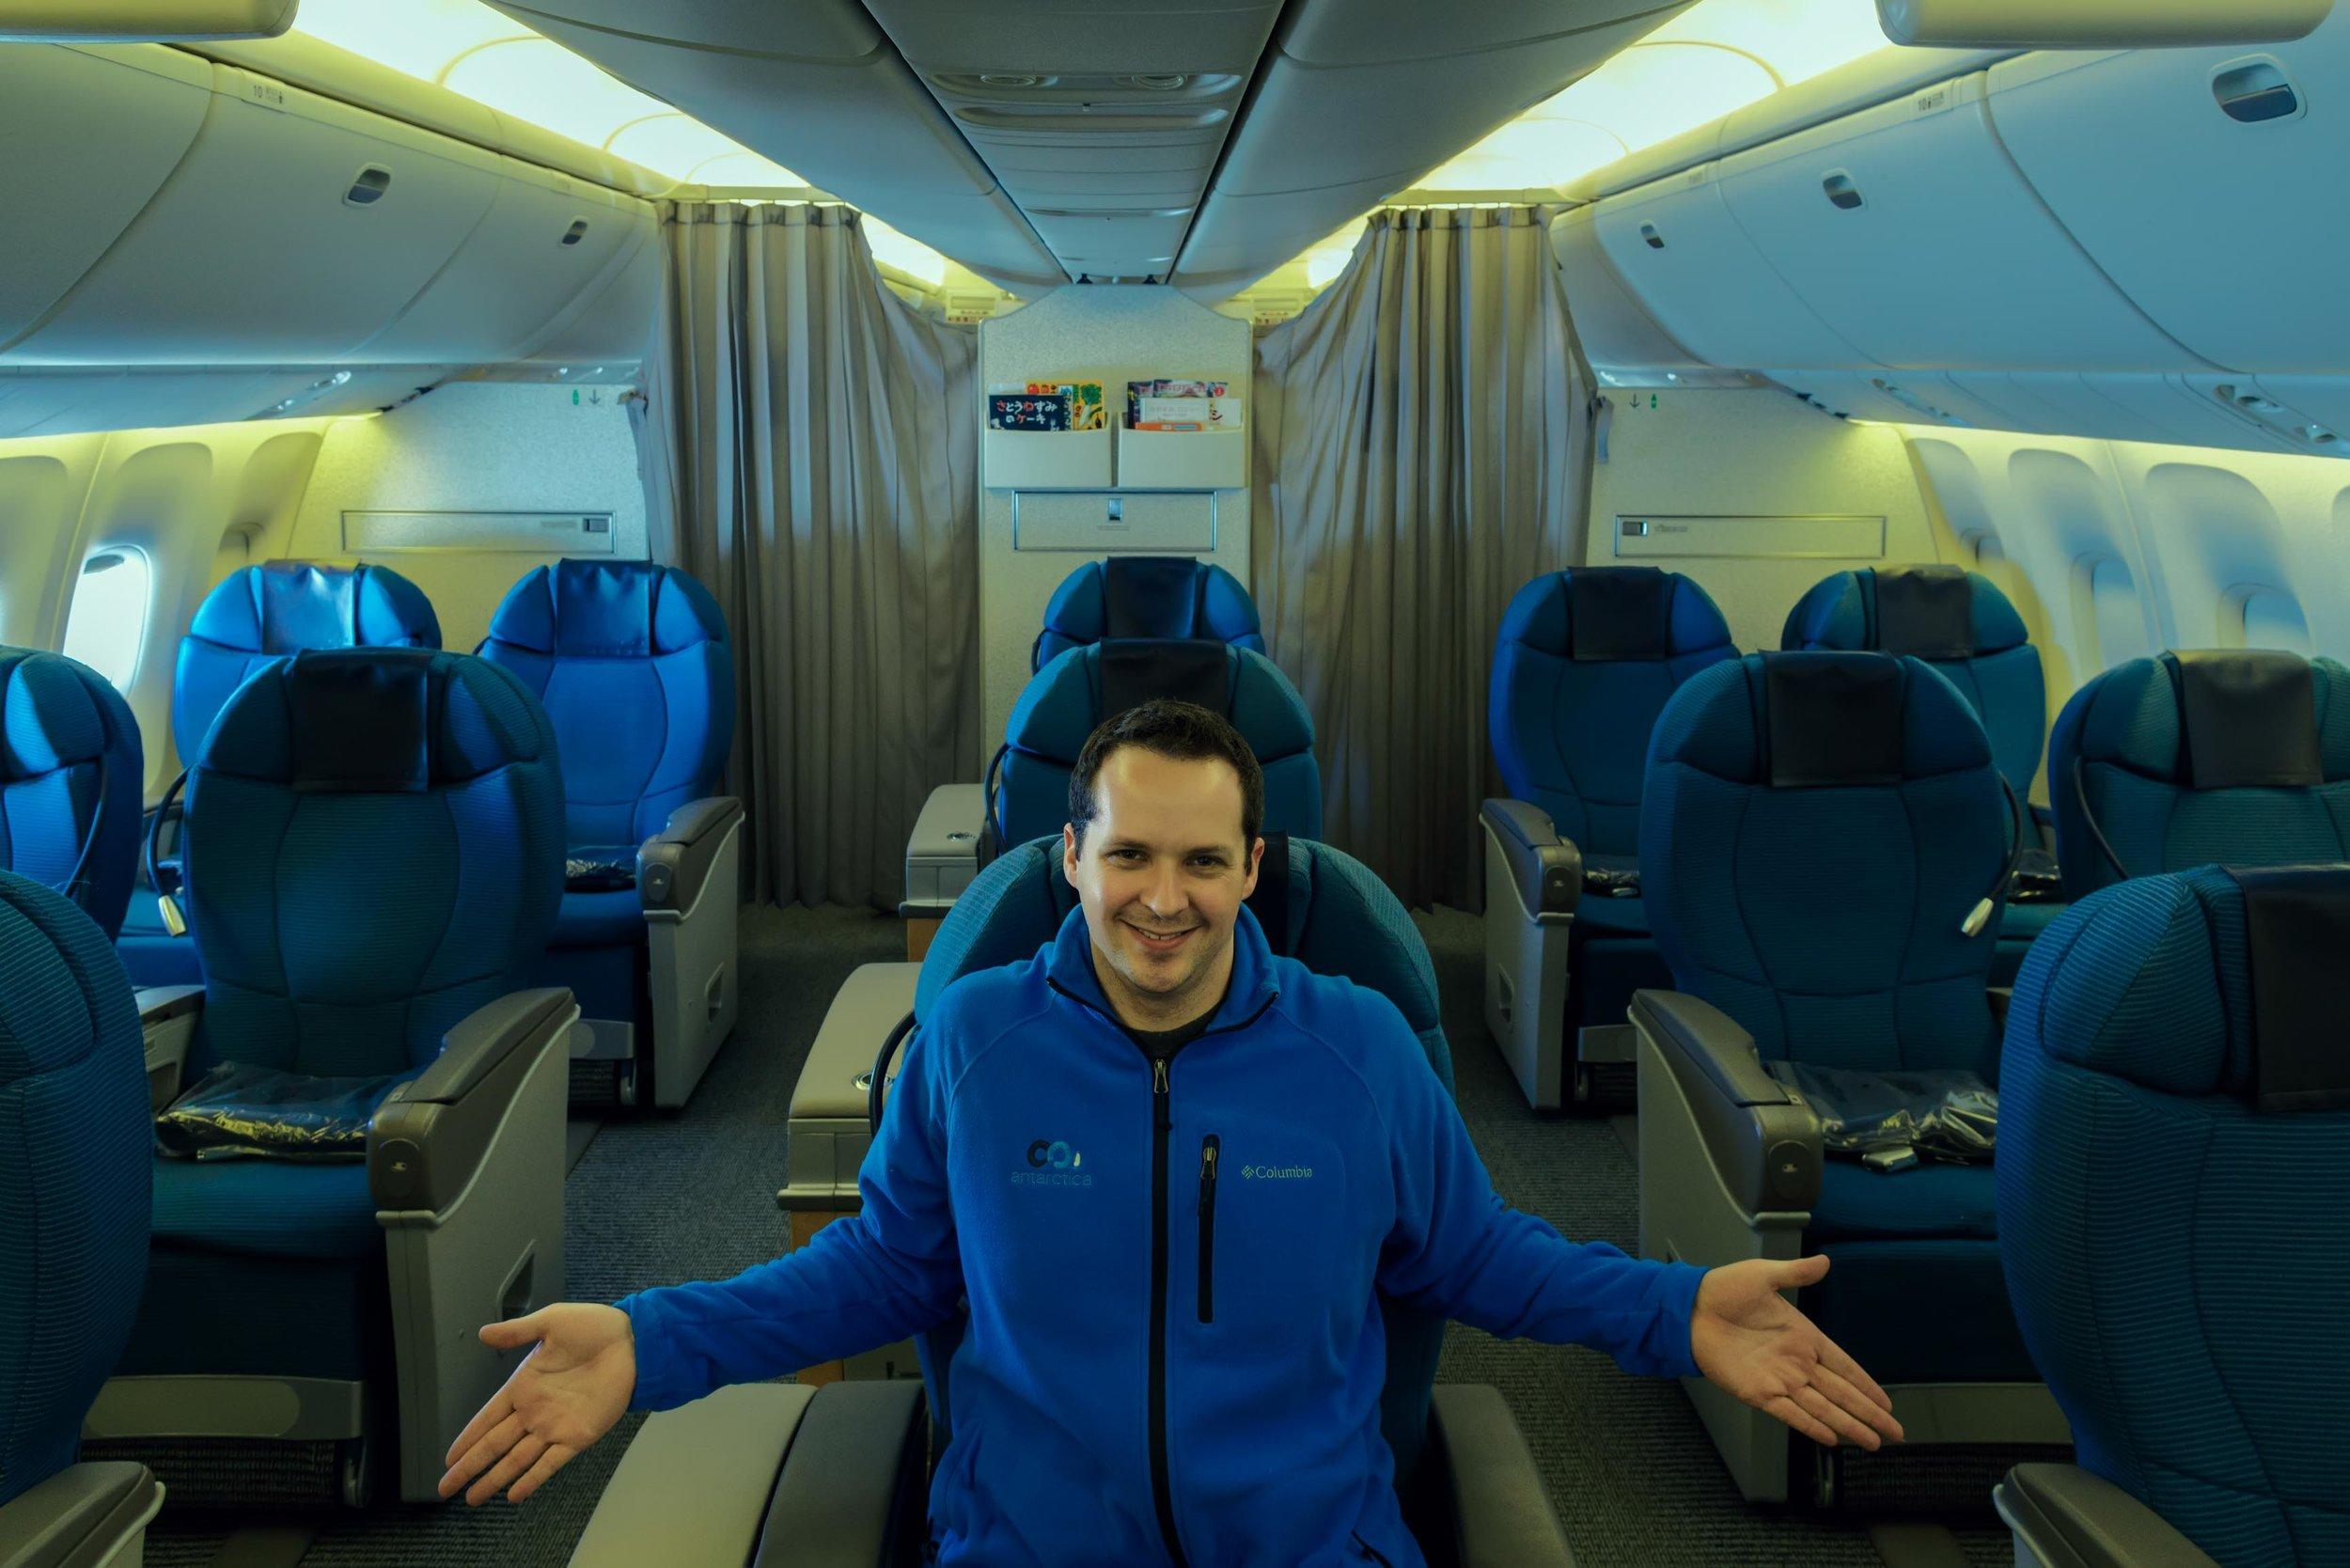 Aboard ANA's 767-300 from Osaka to Shanghai